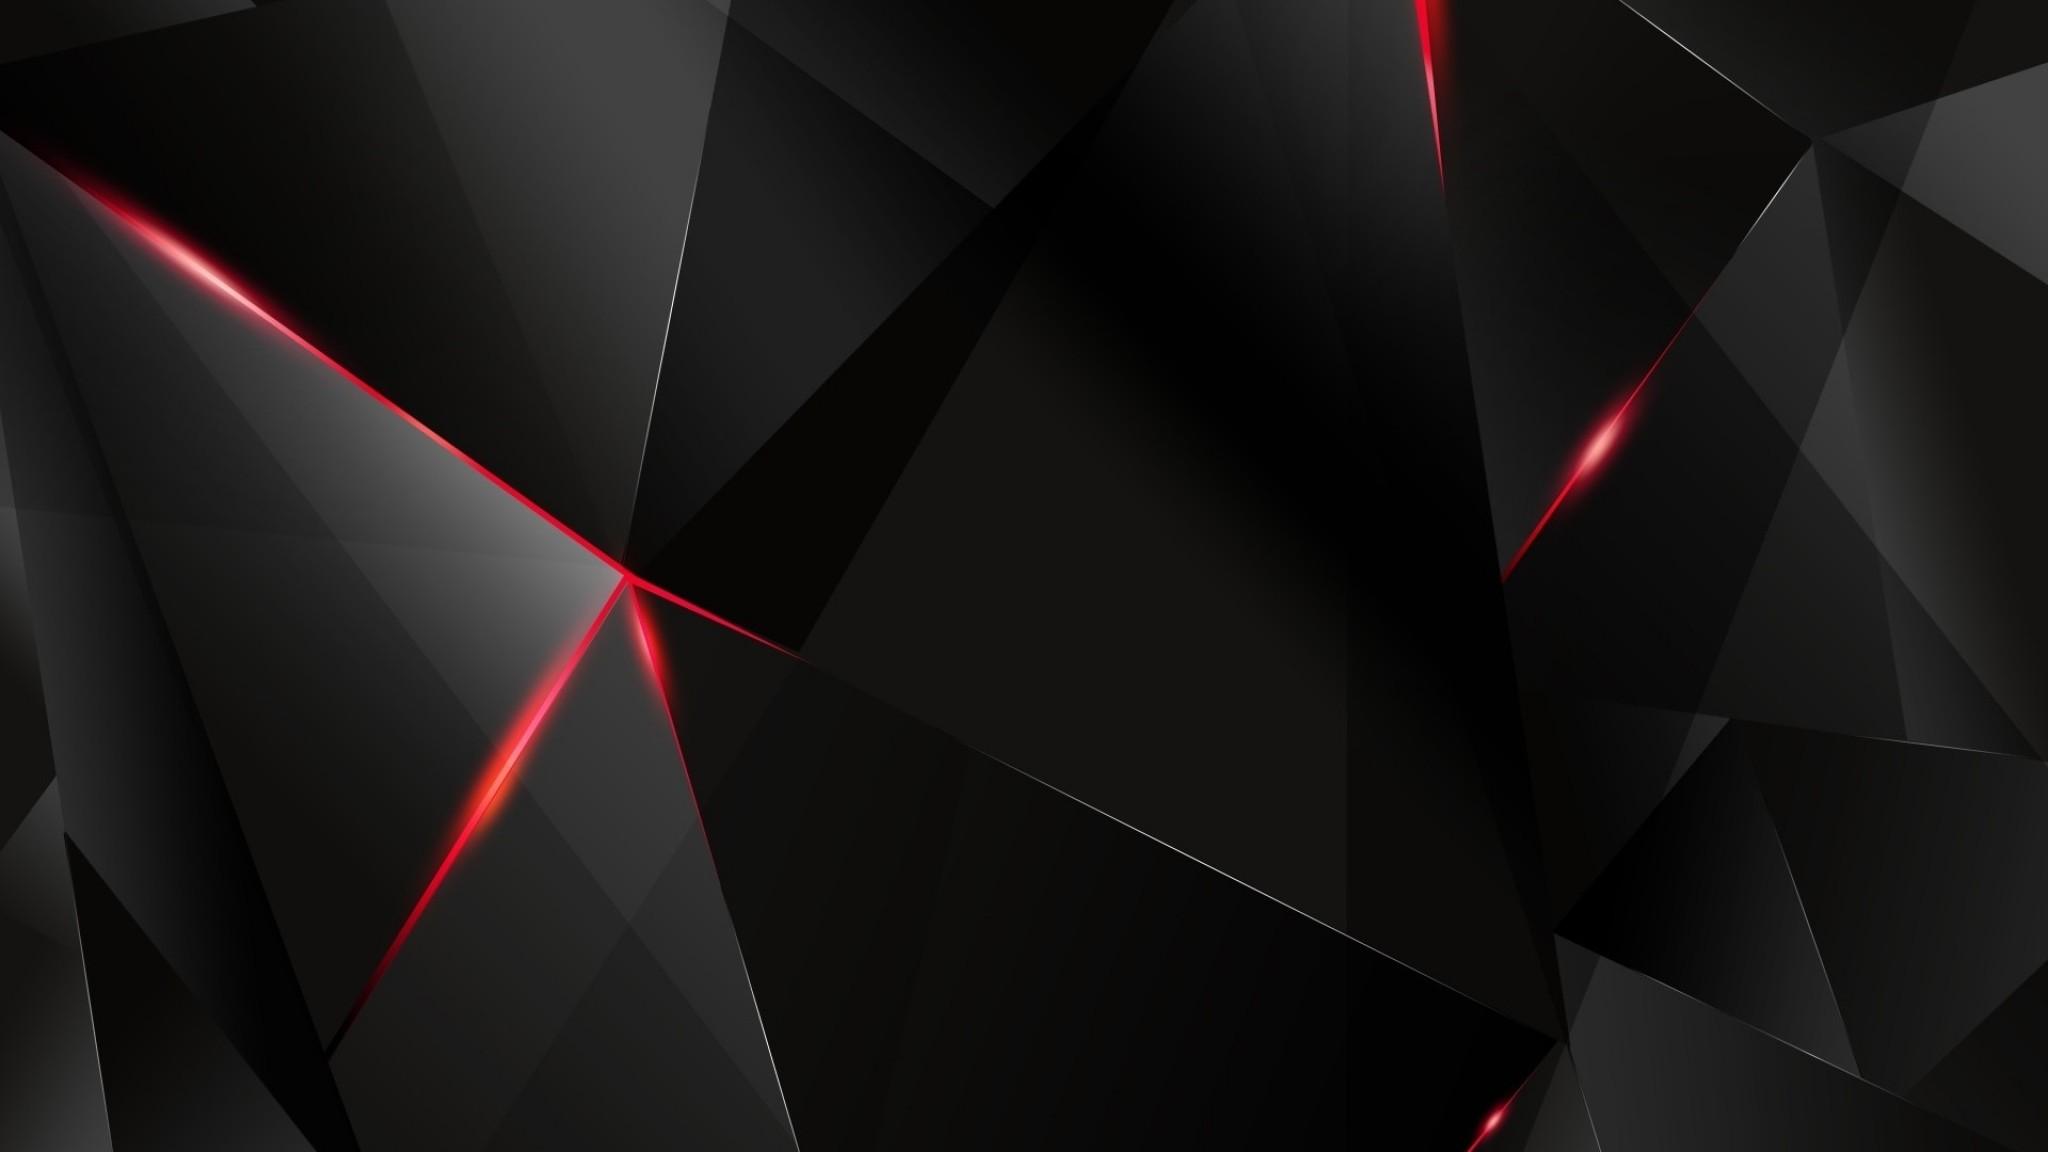 Wallpaper Black, Light, Dark, Figures HD HD Background .